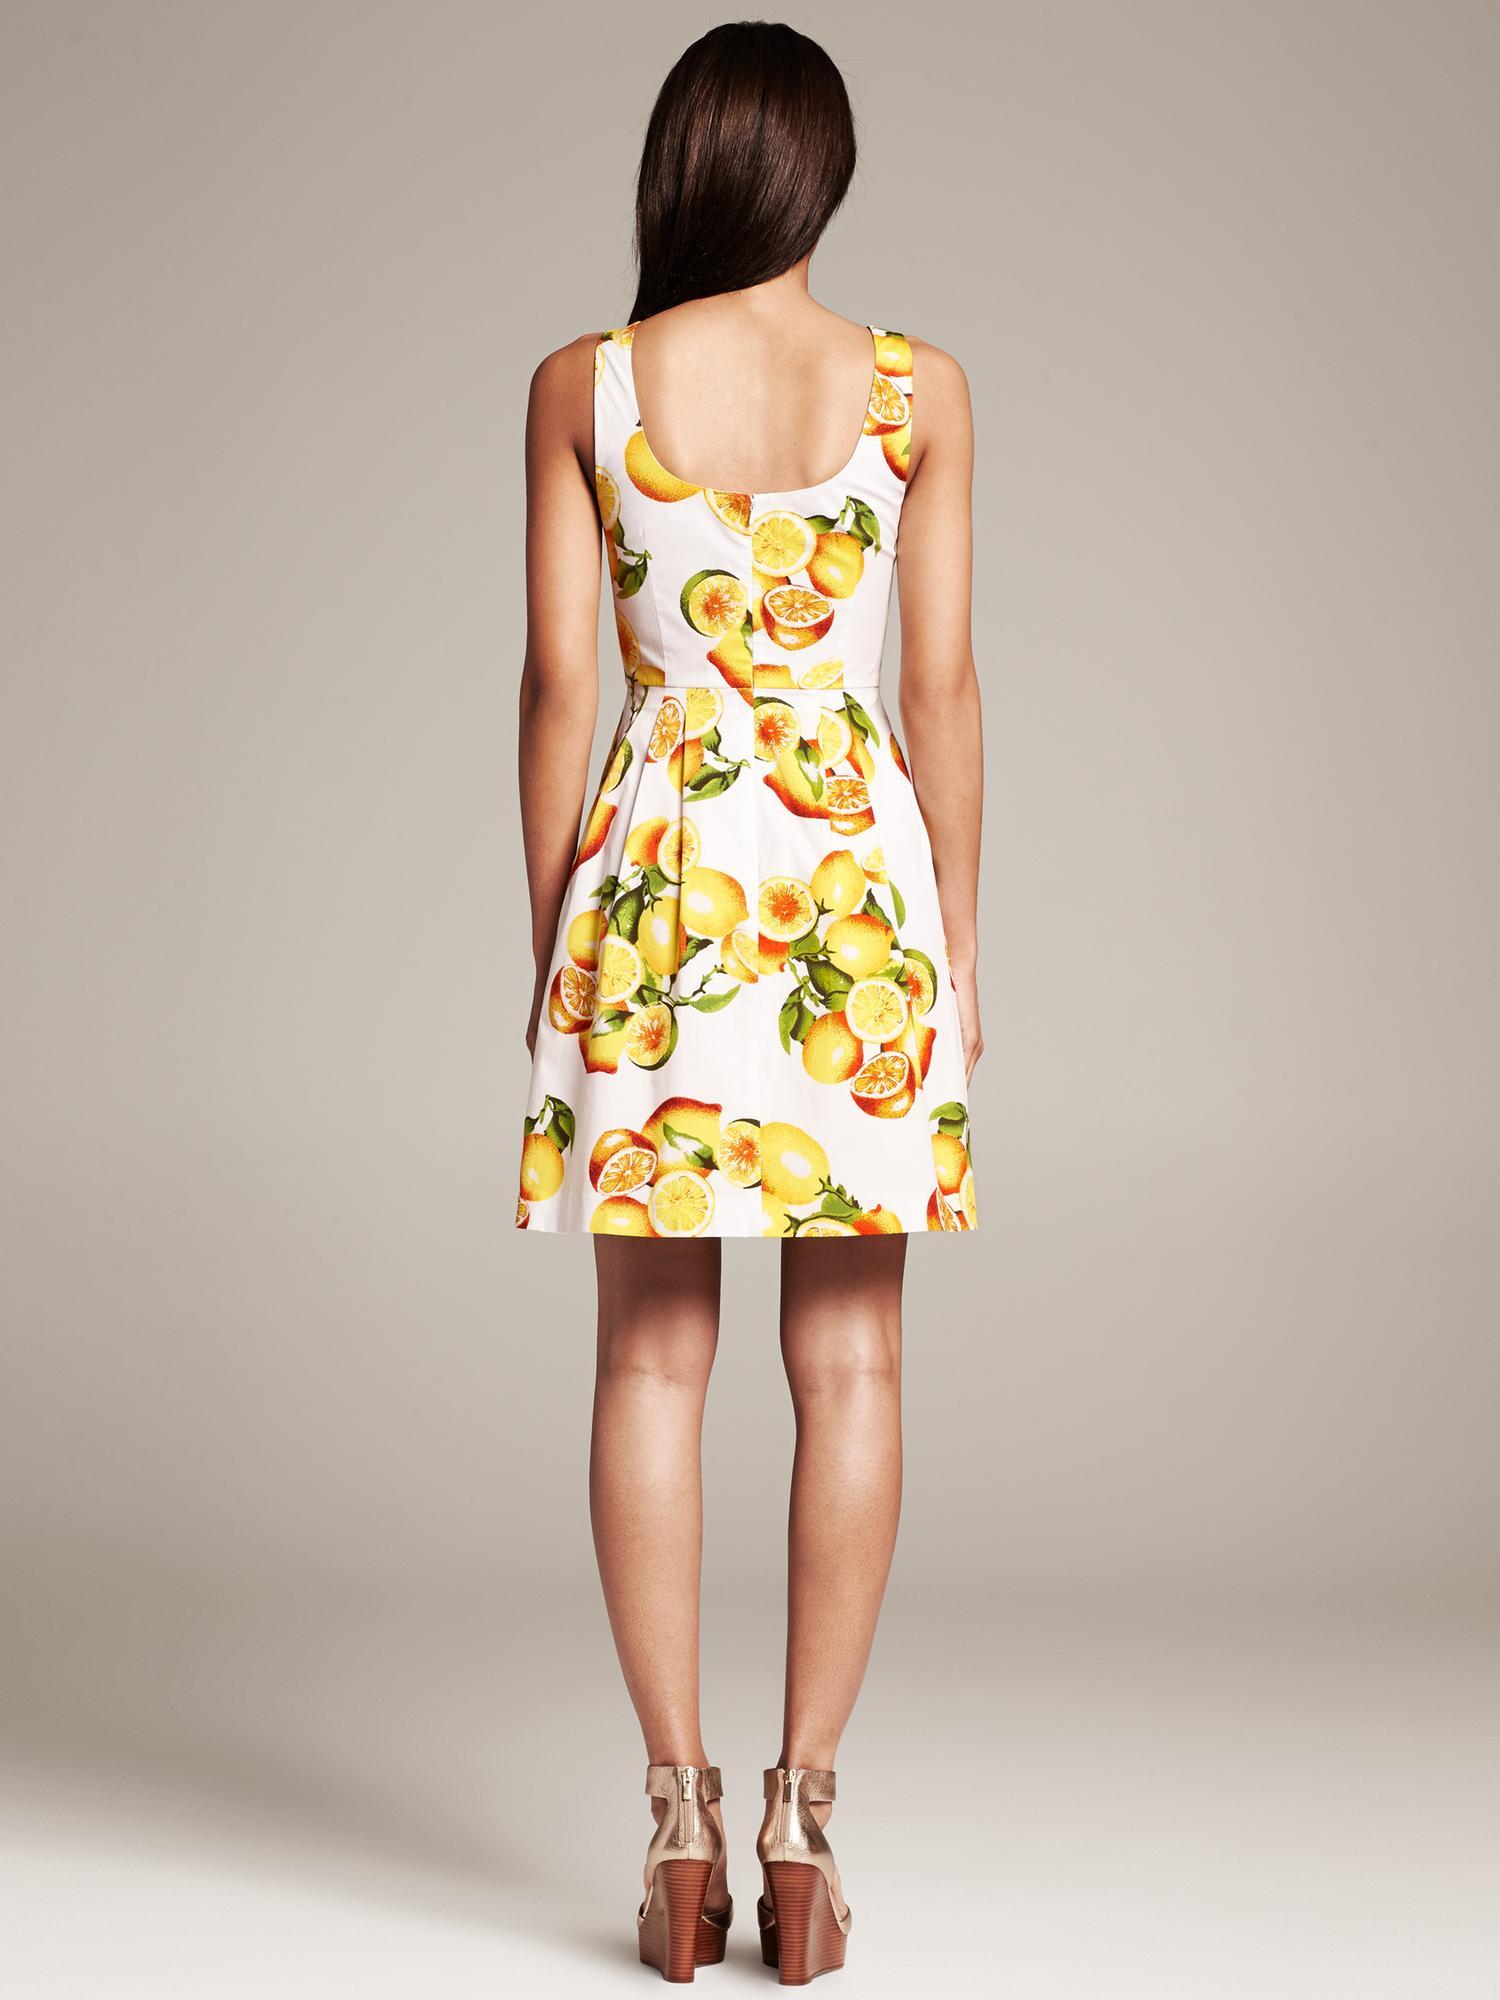 Banana Republic Lemon Print Fit And Flare Dress White In